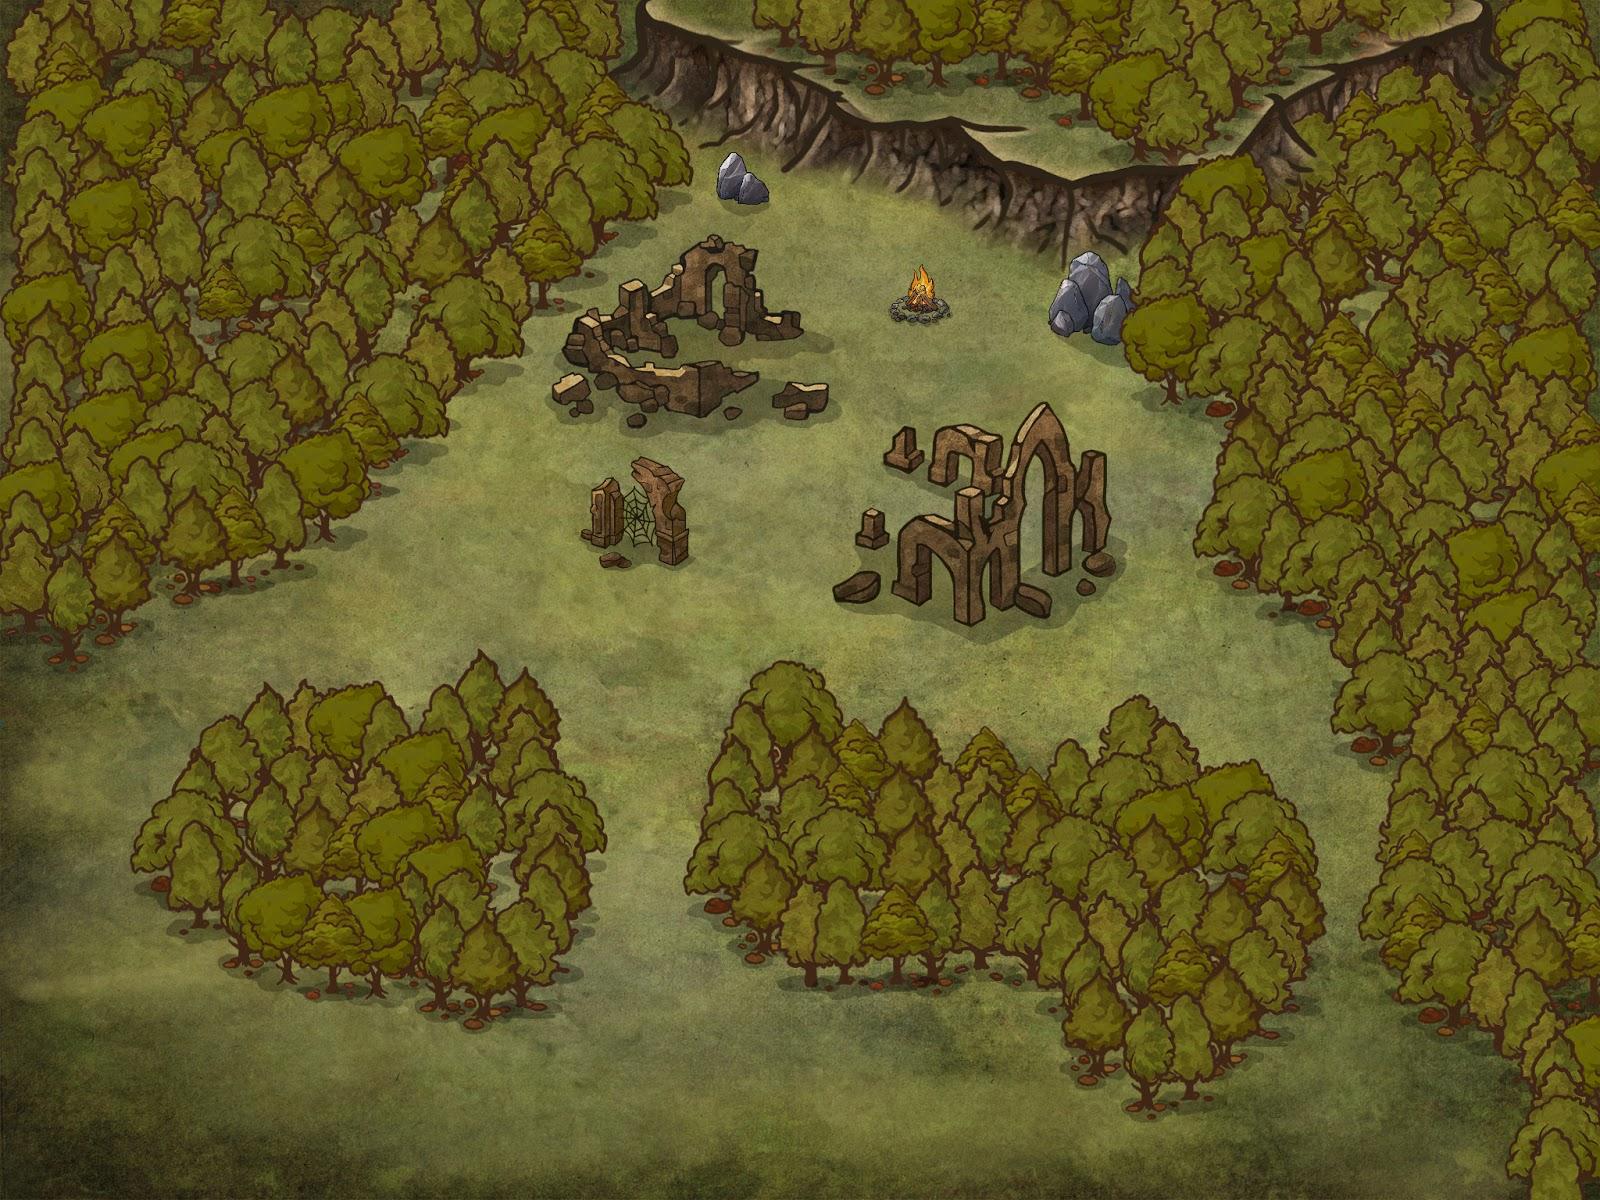 Aventura D&D 5 Edición - Al Quinto Tañido - Interior del Bosque